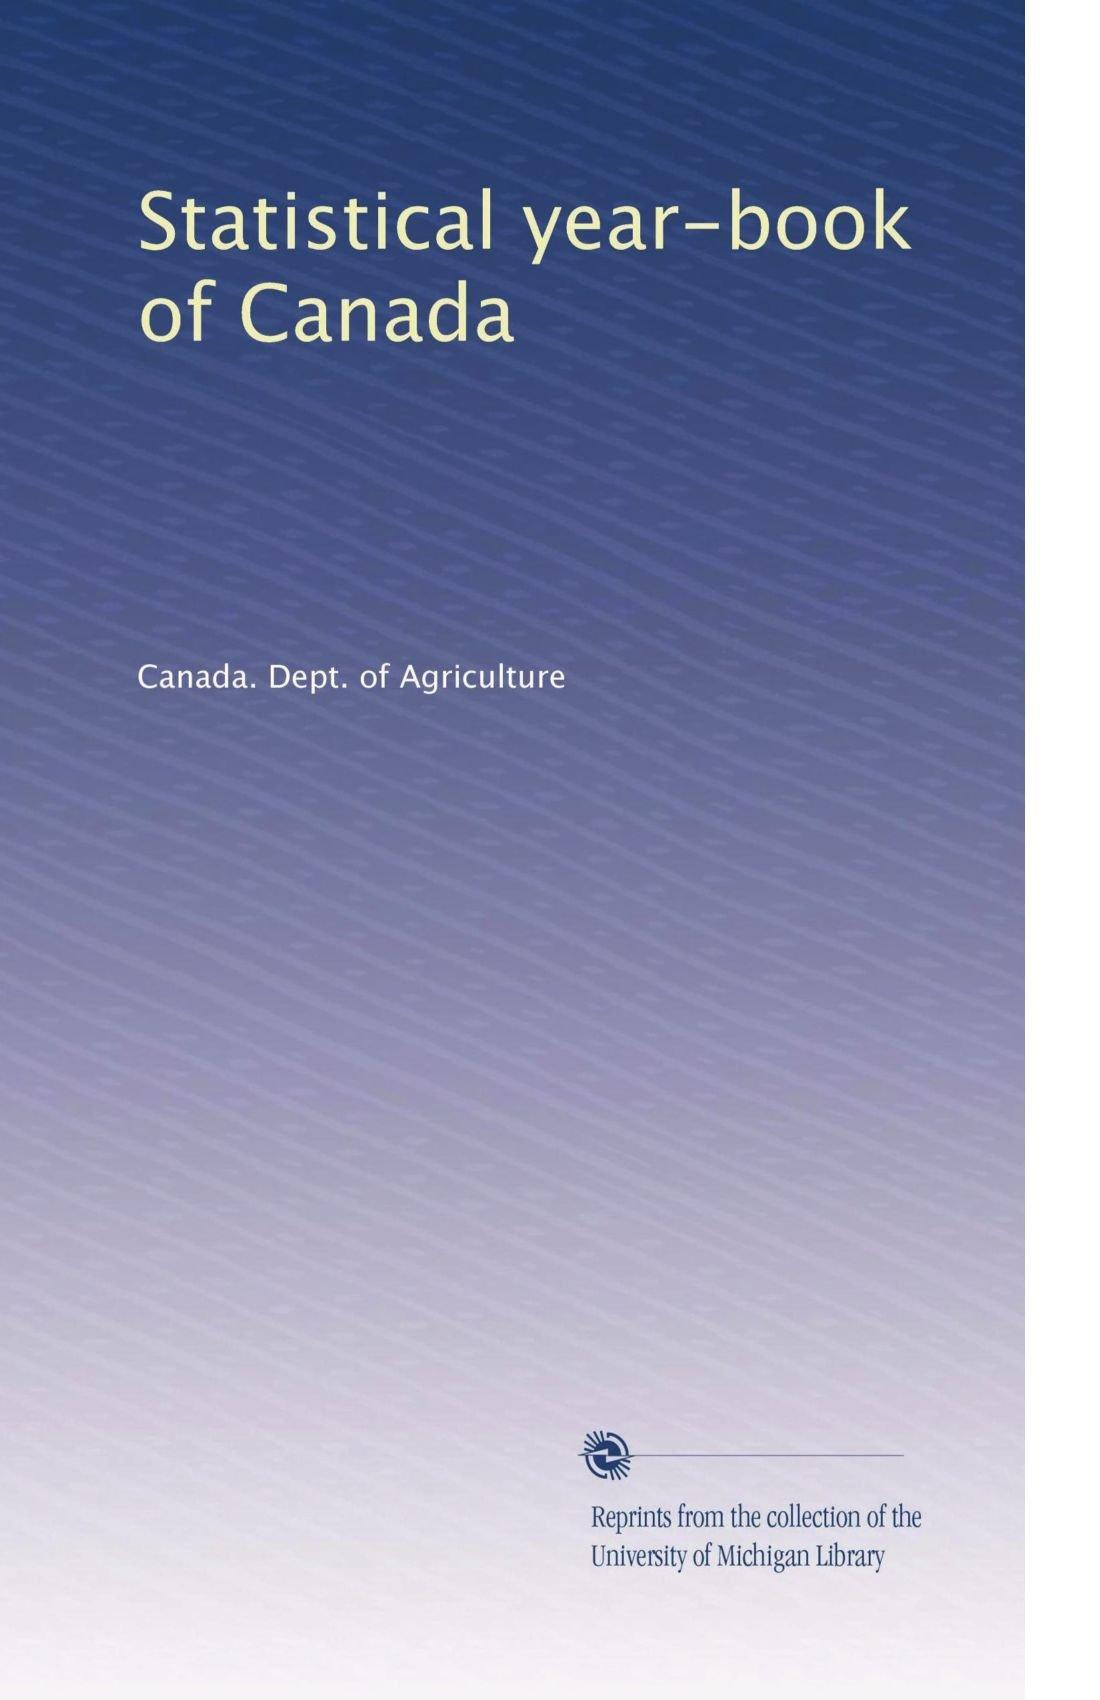 Download Statistical year-book of Canada (Volume 5) ebook